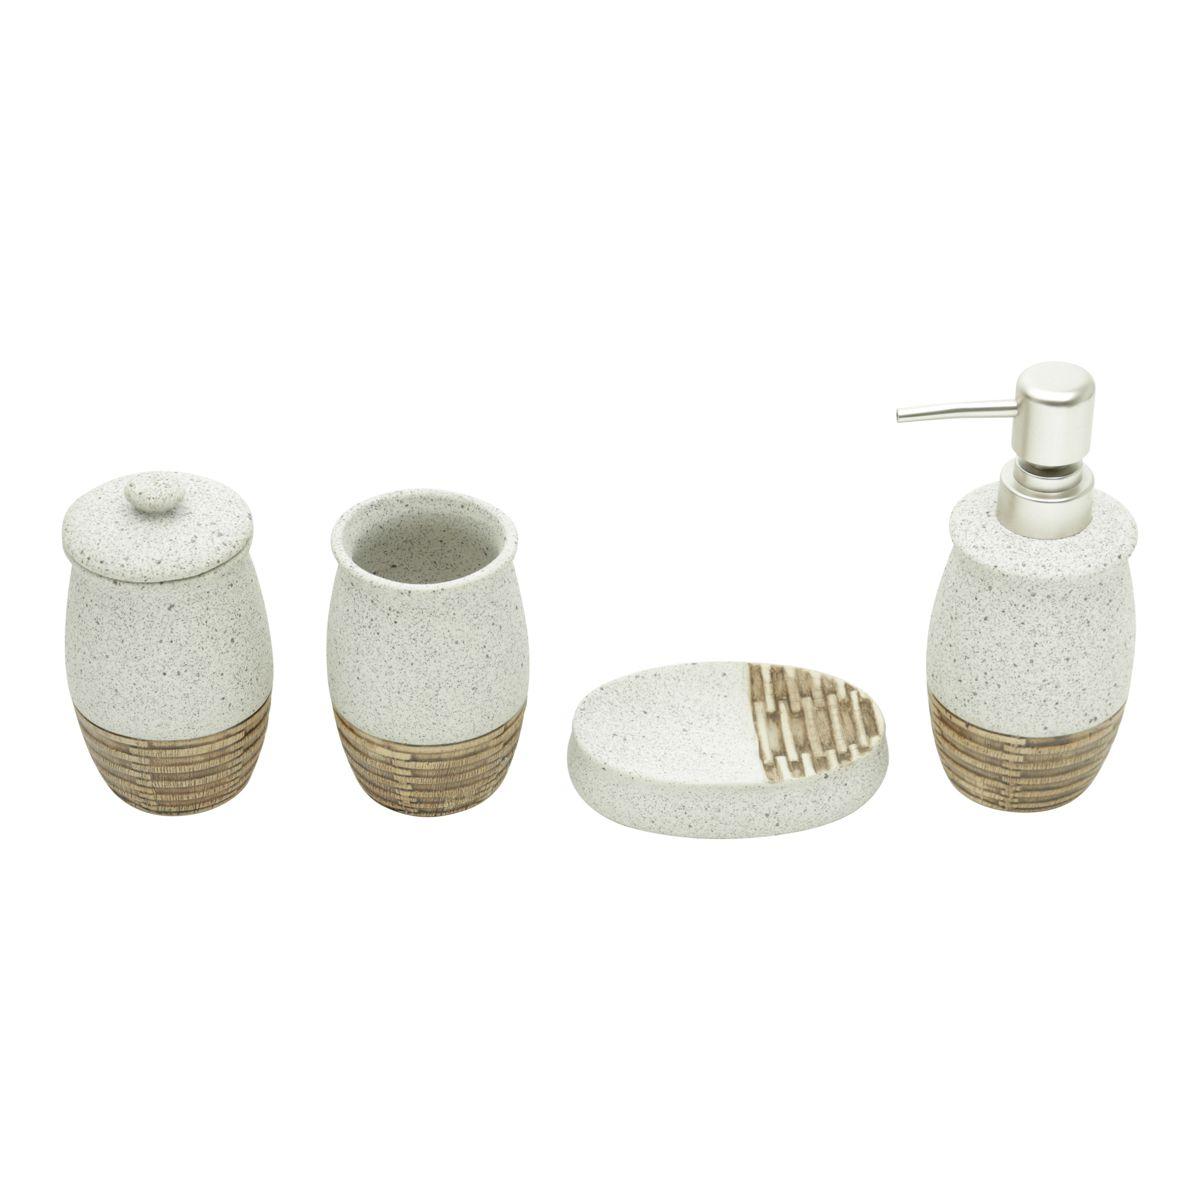 Kit Banheiro  4 pcs de Cerâmica Stone Silver Mat